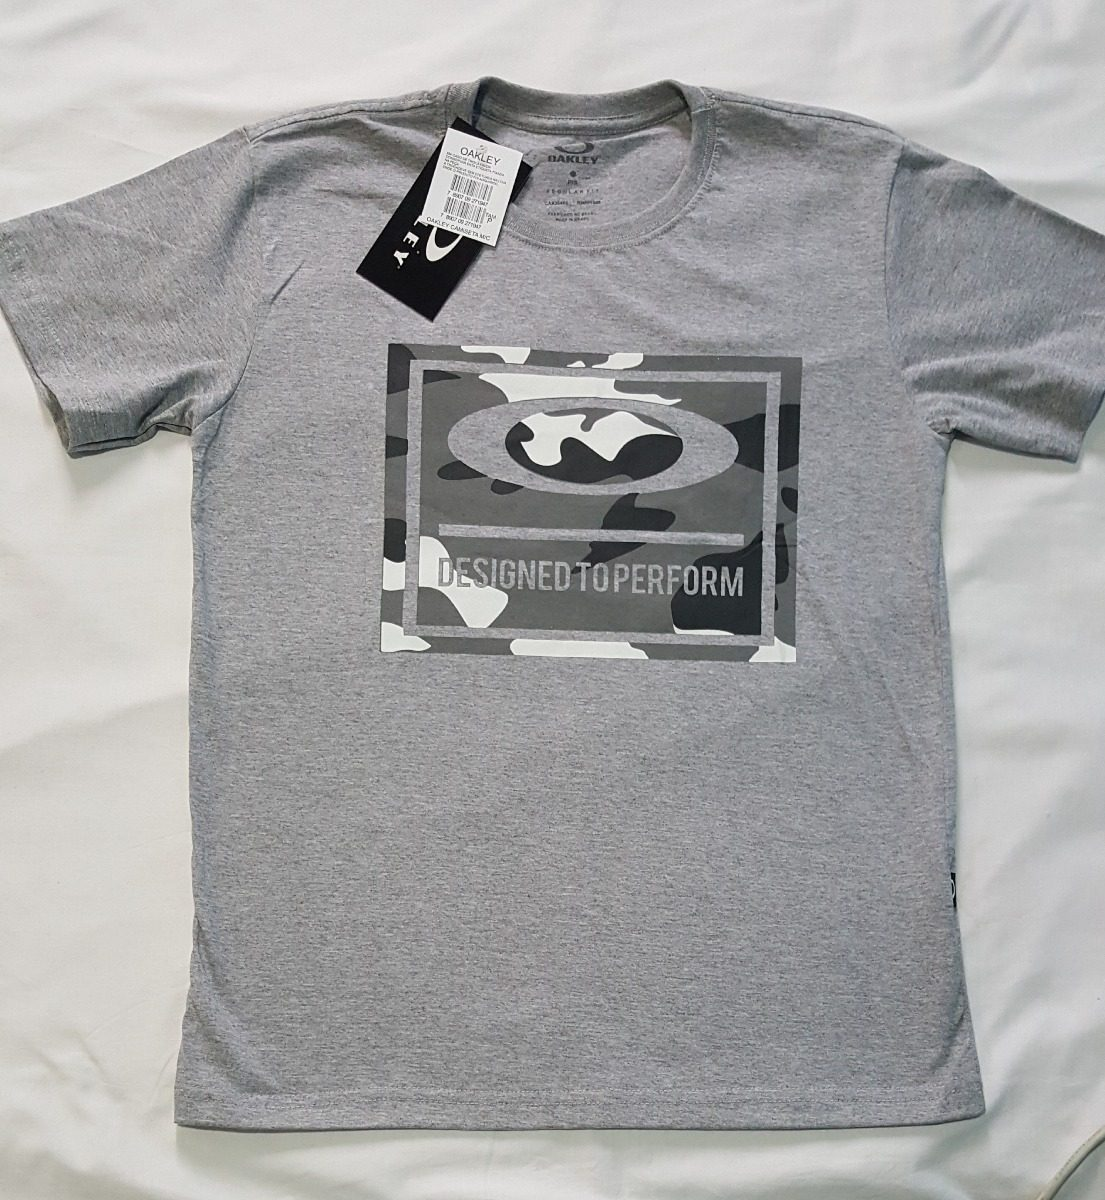 nova camisa da oakley masculino quiksilver top. Carregando zoom. 0e2e78b0acb